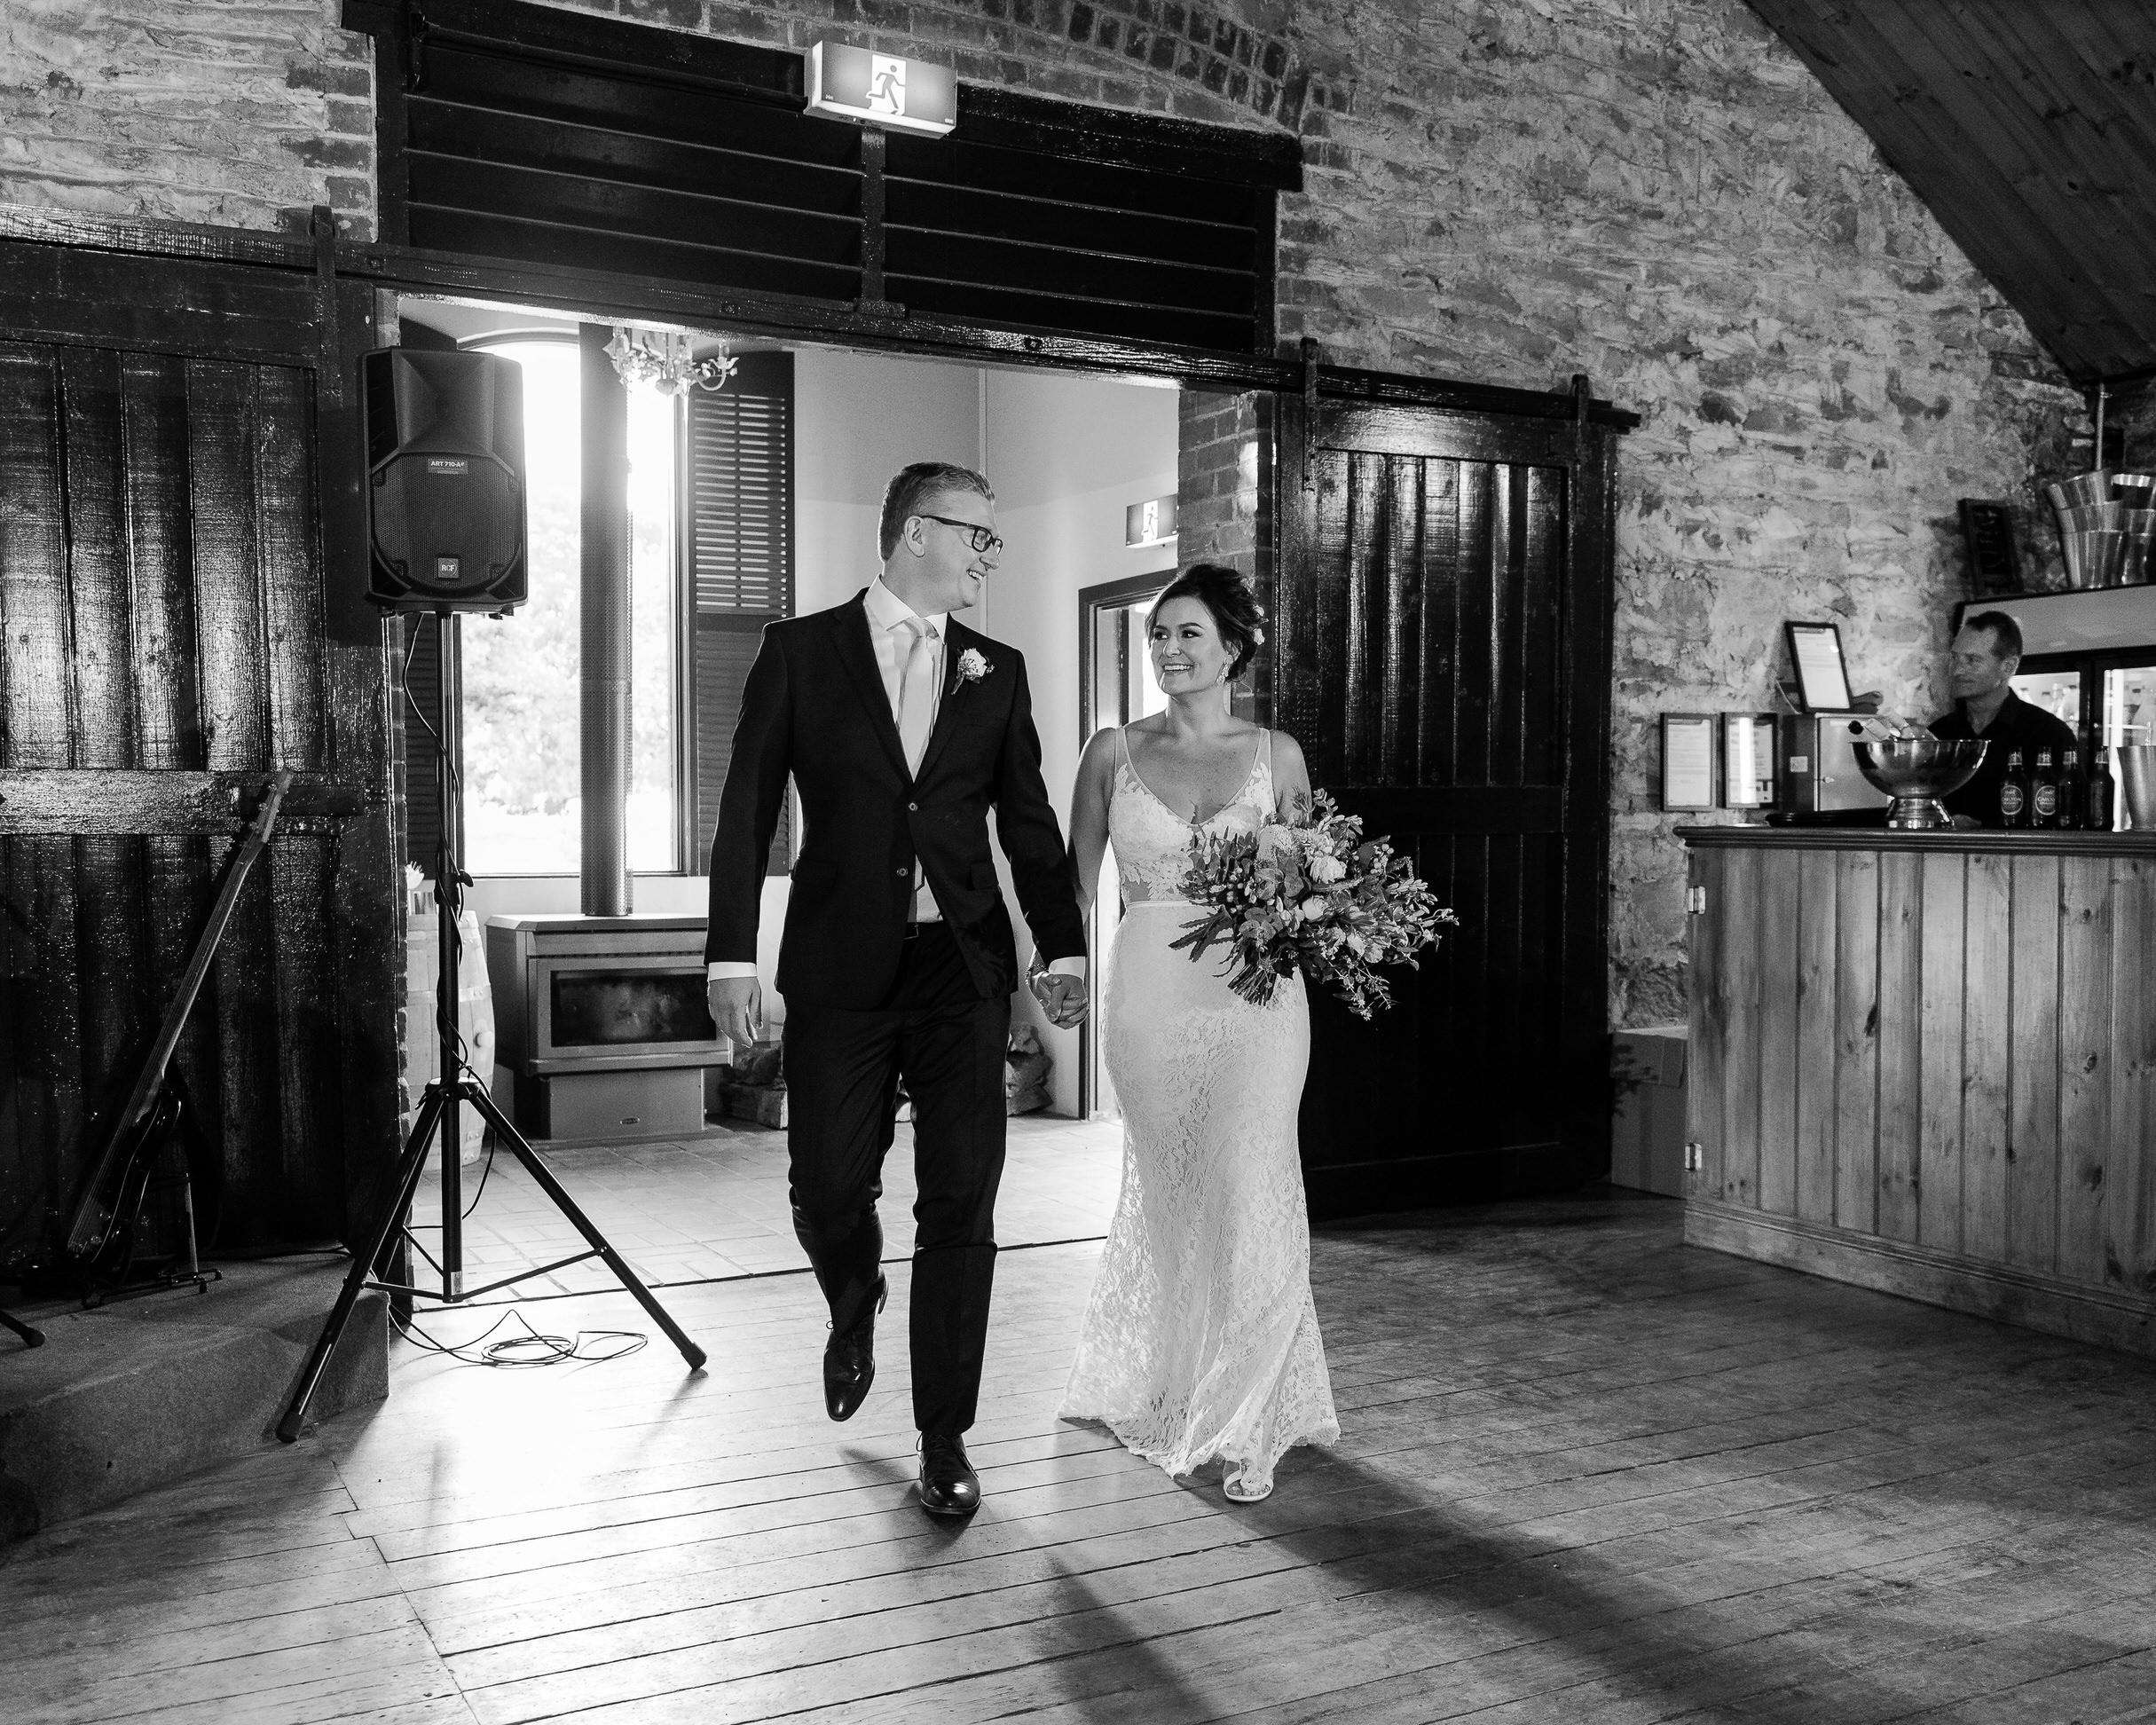 Justin_And_Jim_Photography_Chateau_Dore_Bendigo_Wedding77.JPG